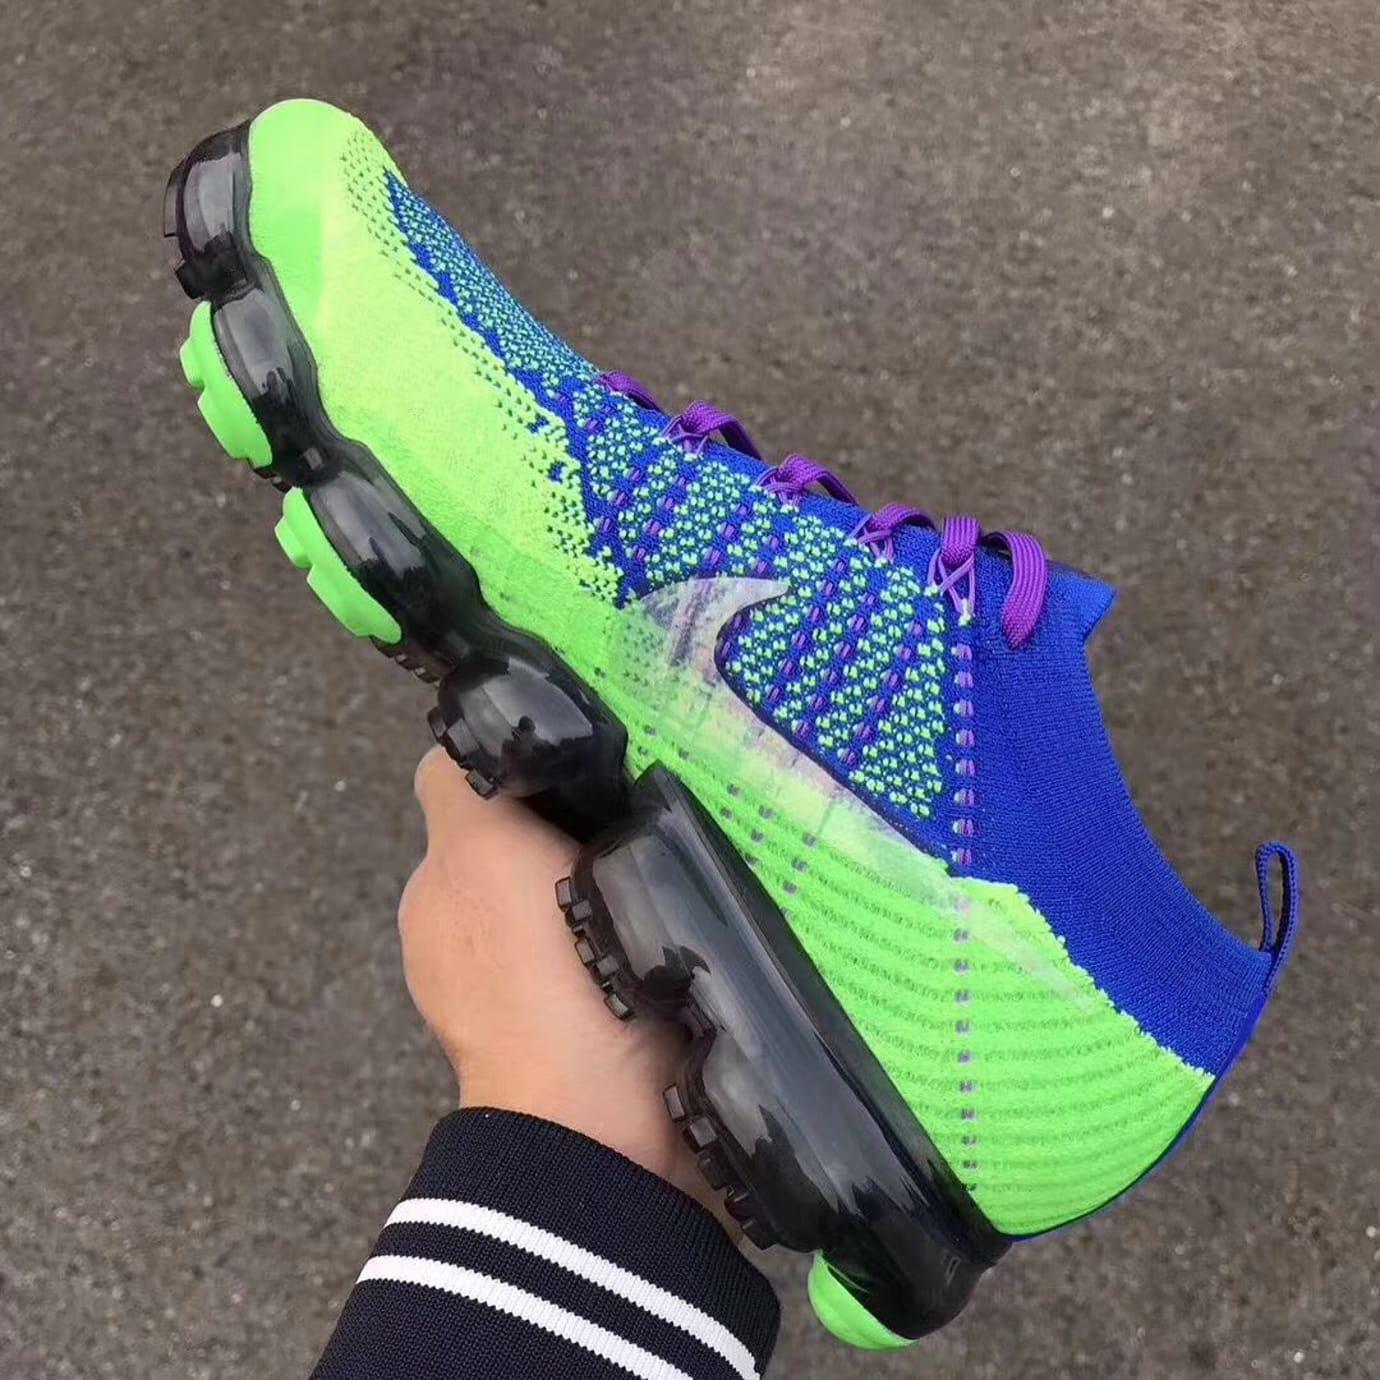 51122cc0d7 Nike Air VaporMax Doernbecher Andrew Merydith Release Date | Sole ...